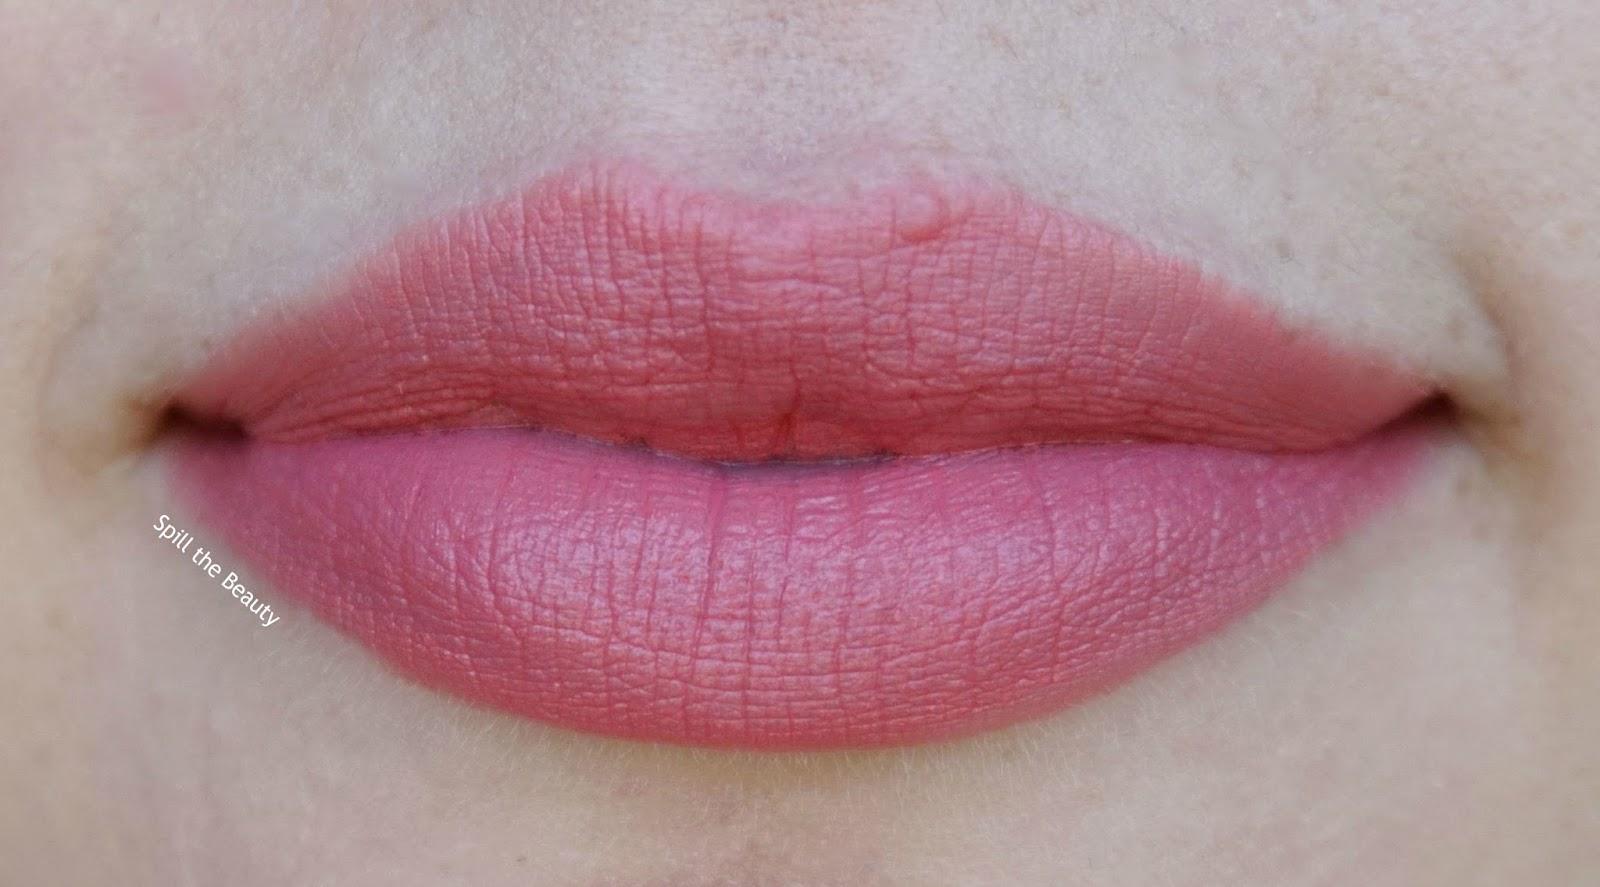 thefaceshop over girl edge lip crayon be01